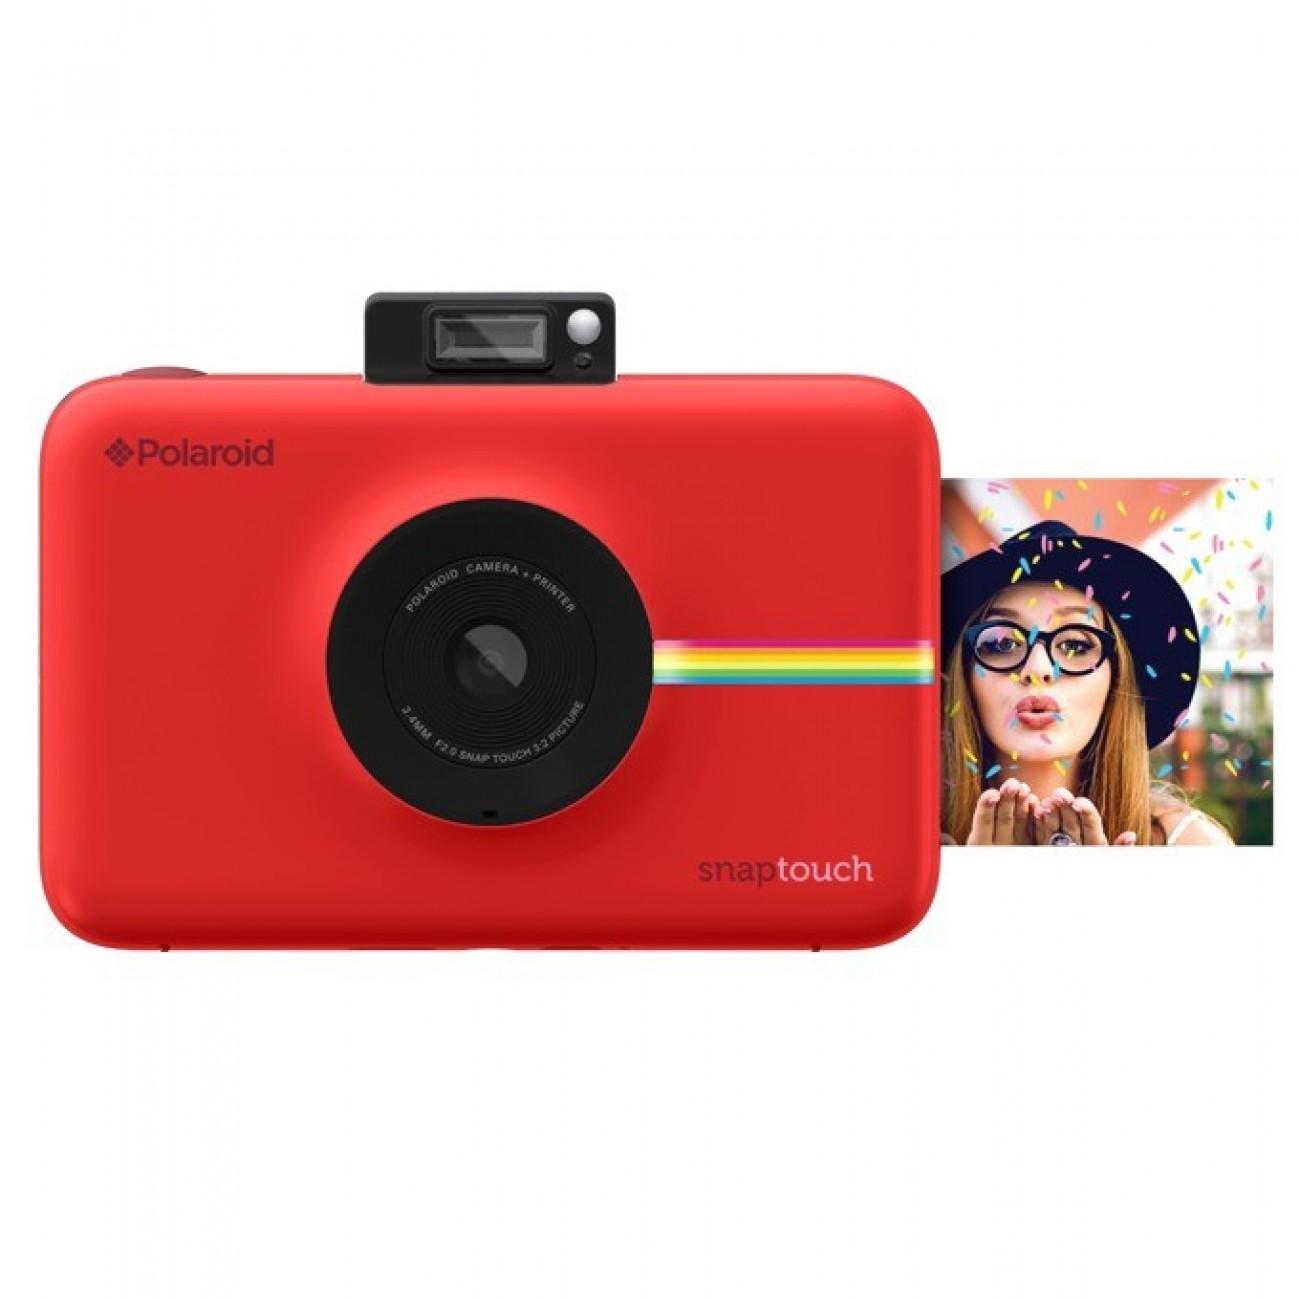 Фотоапарат Polaroid Snap Touch, 13.0 Mpix, 3.5 (8.89cm) сензорен мулти-тъч дисплей, MicroSD слот, 1080p видео резолюция, Bluetooth, червен в Фотоапарати - Polaroid | Alleop